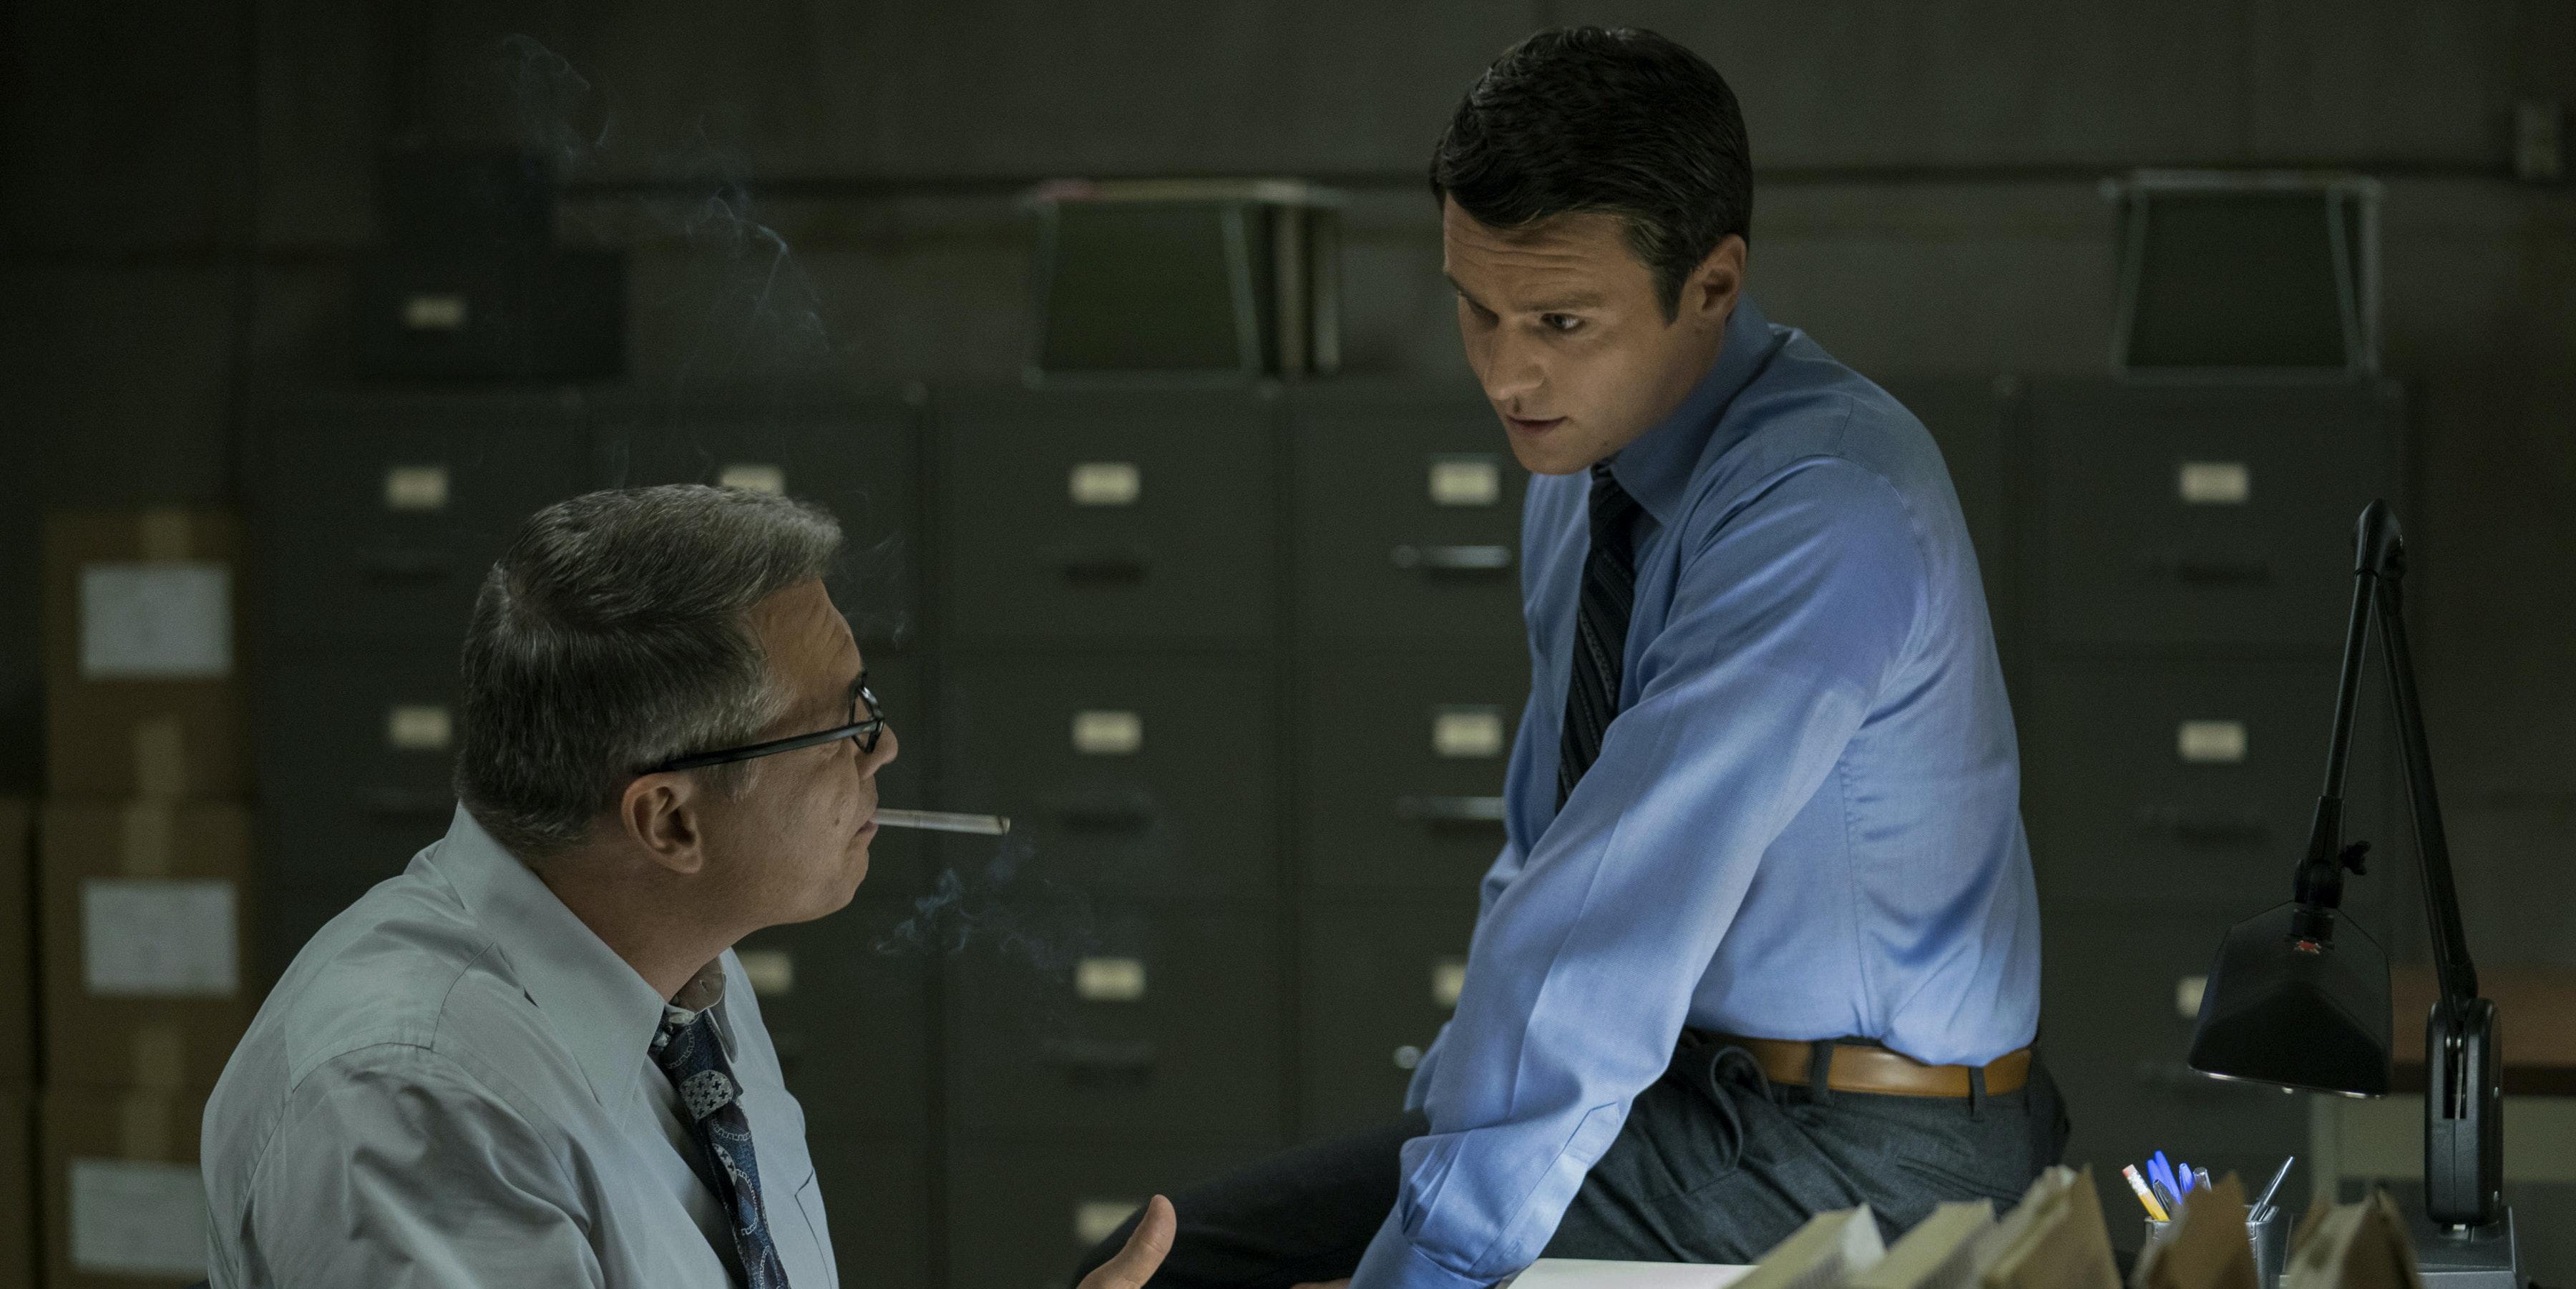 'Mindhunter' Season 2 Could Bring Back a Popular Killer, Actor Hints